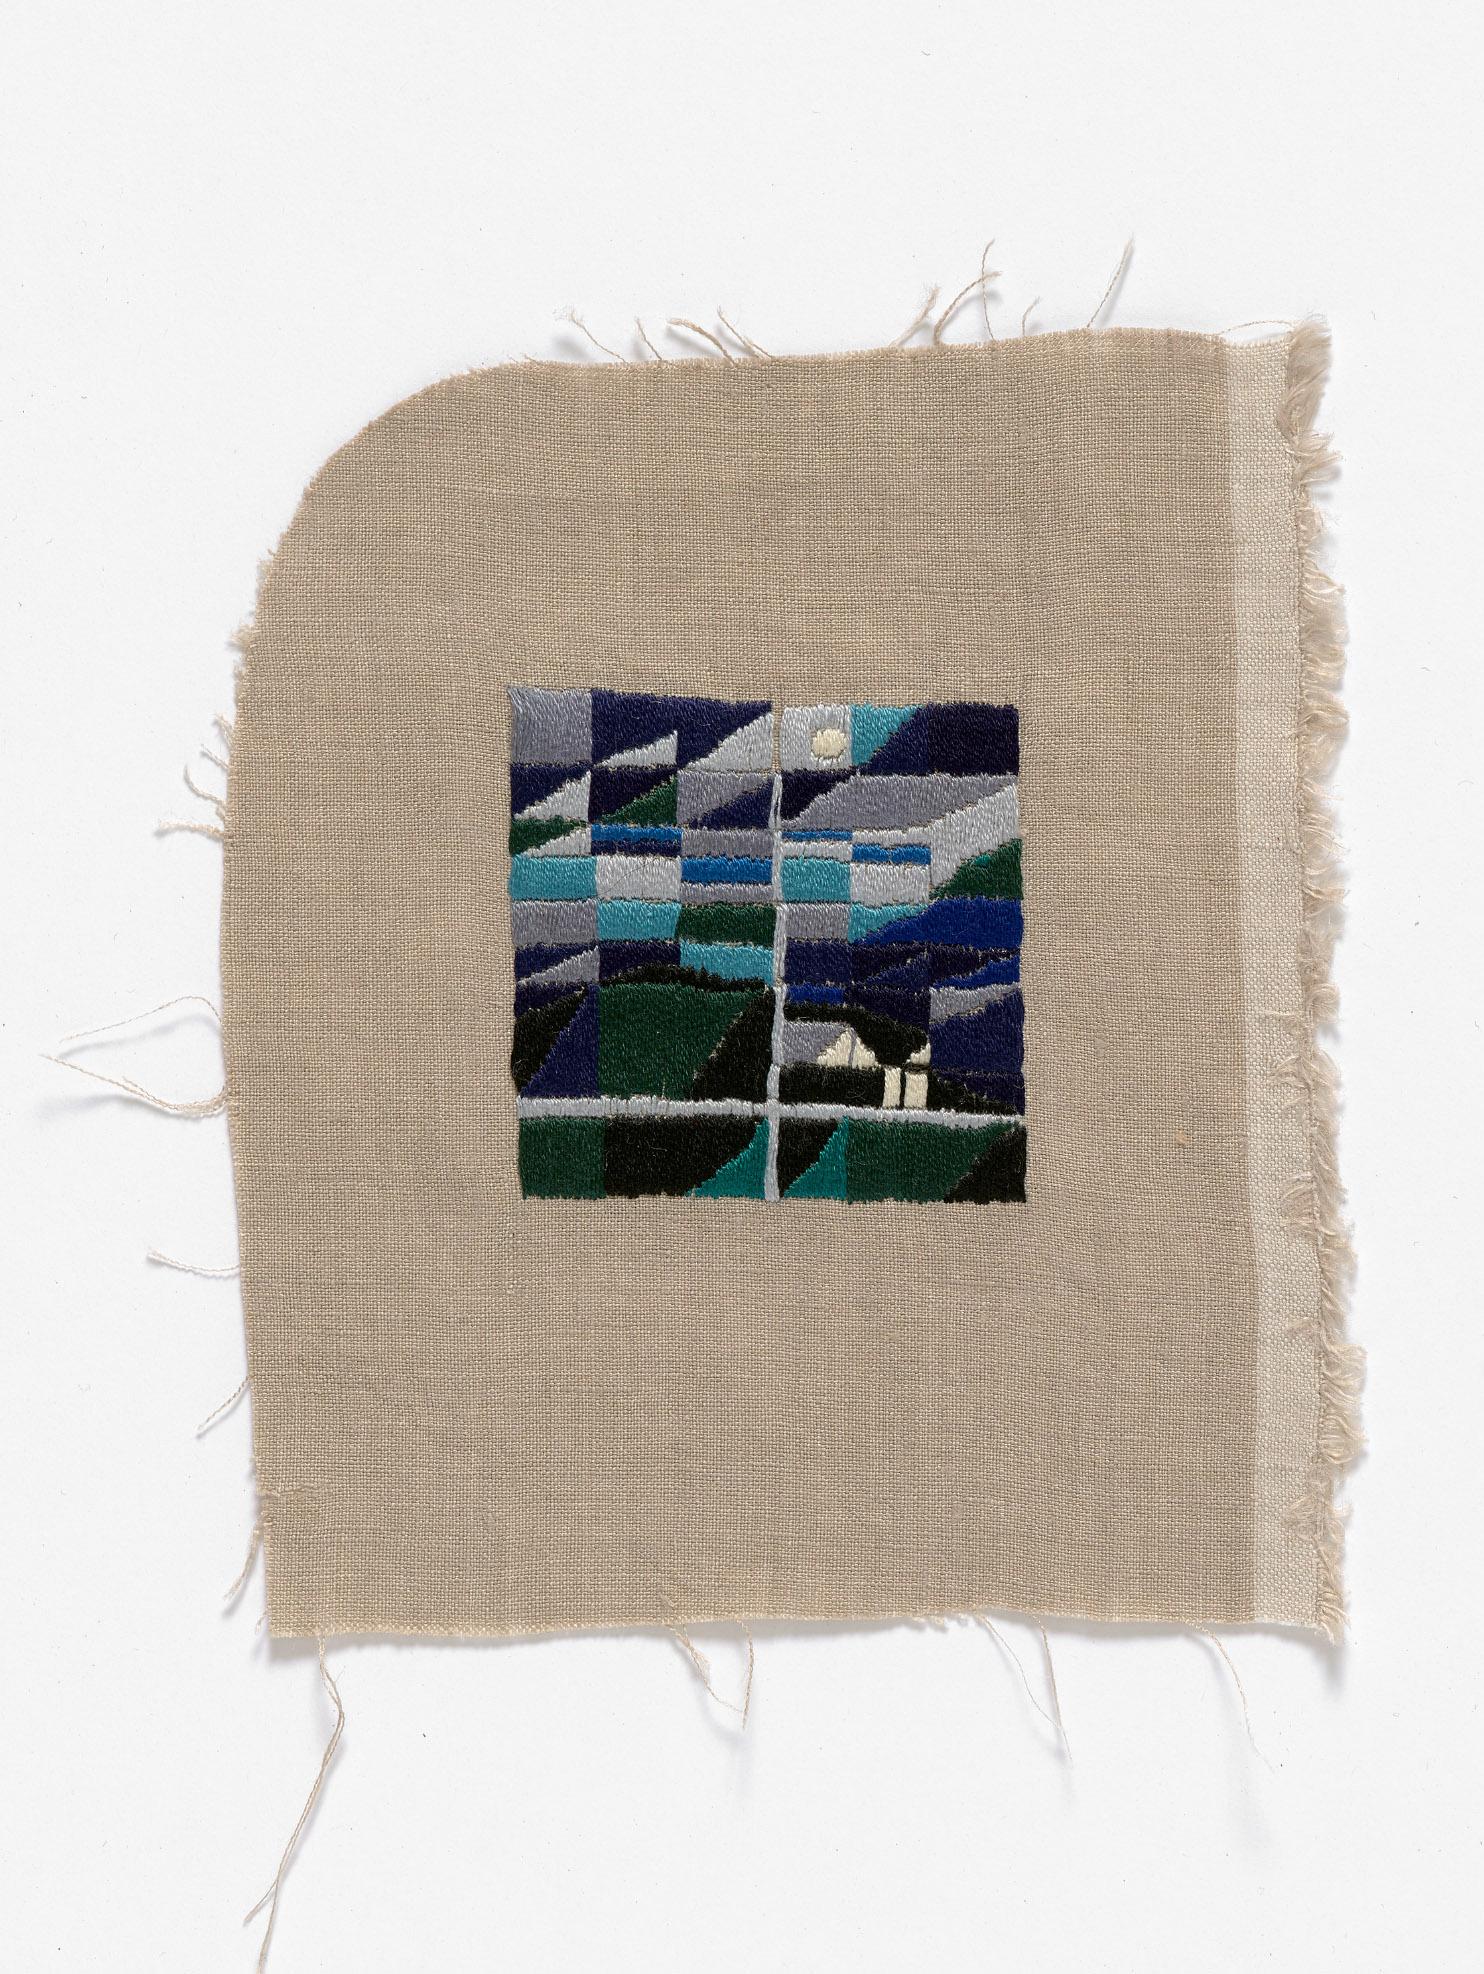 Before bedtime, Venus Bay  2015 Cotton thread on linen 16 x 18cm